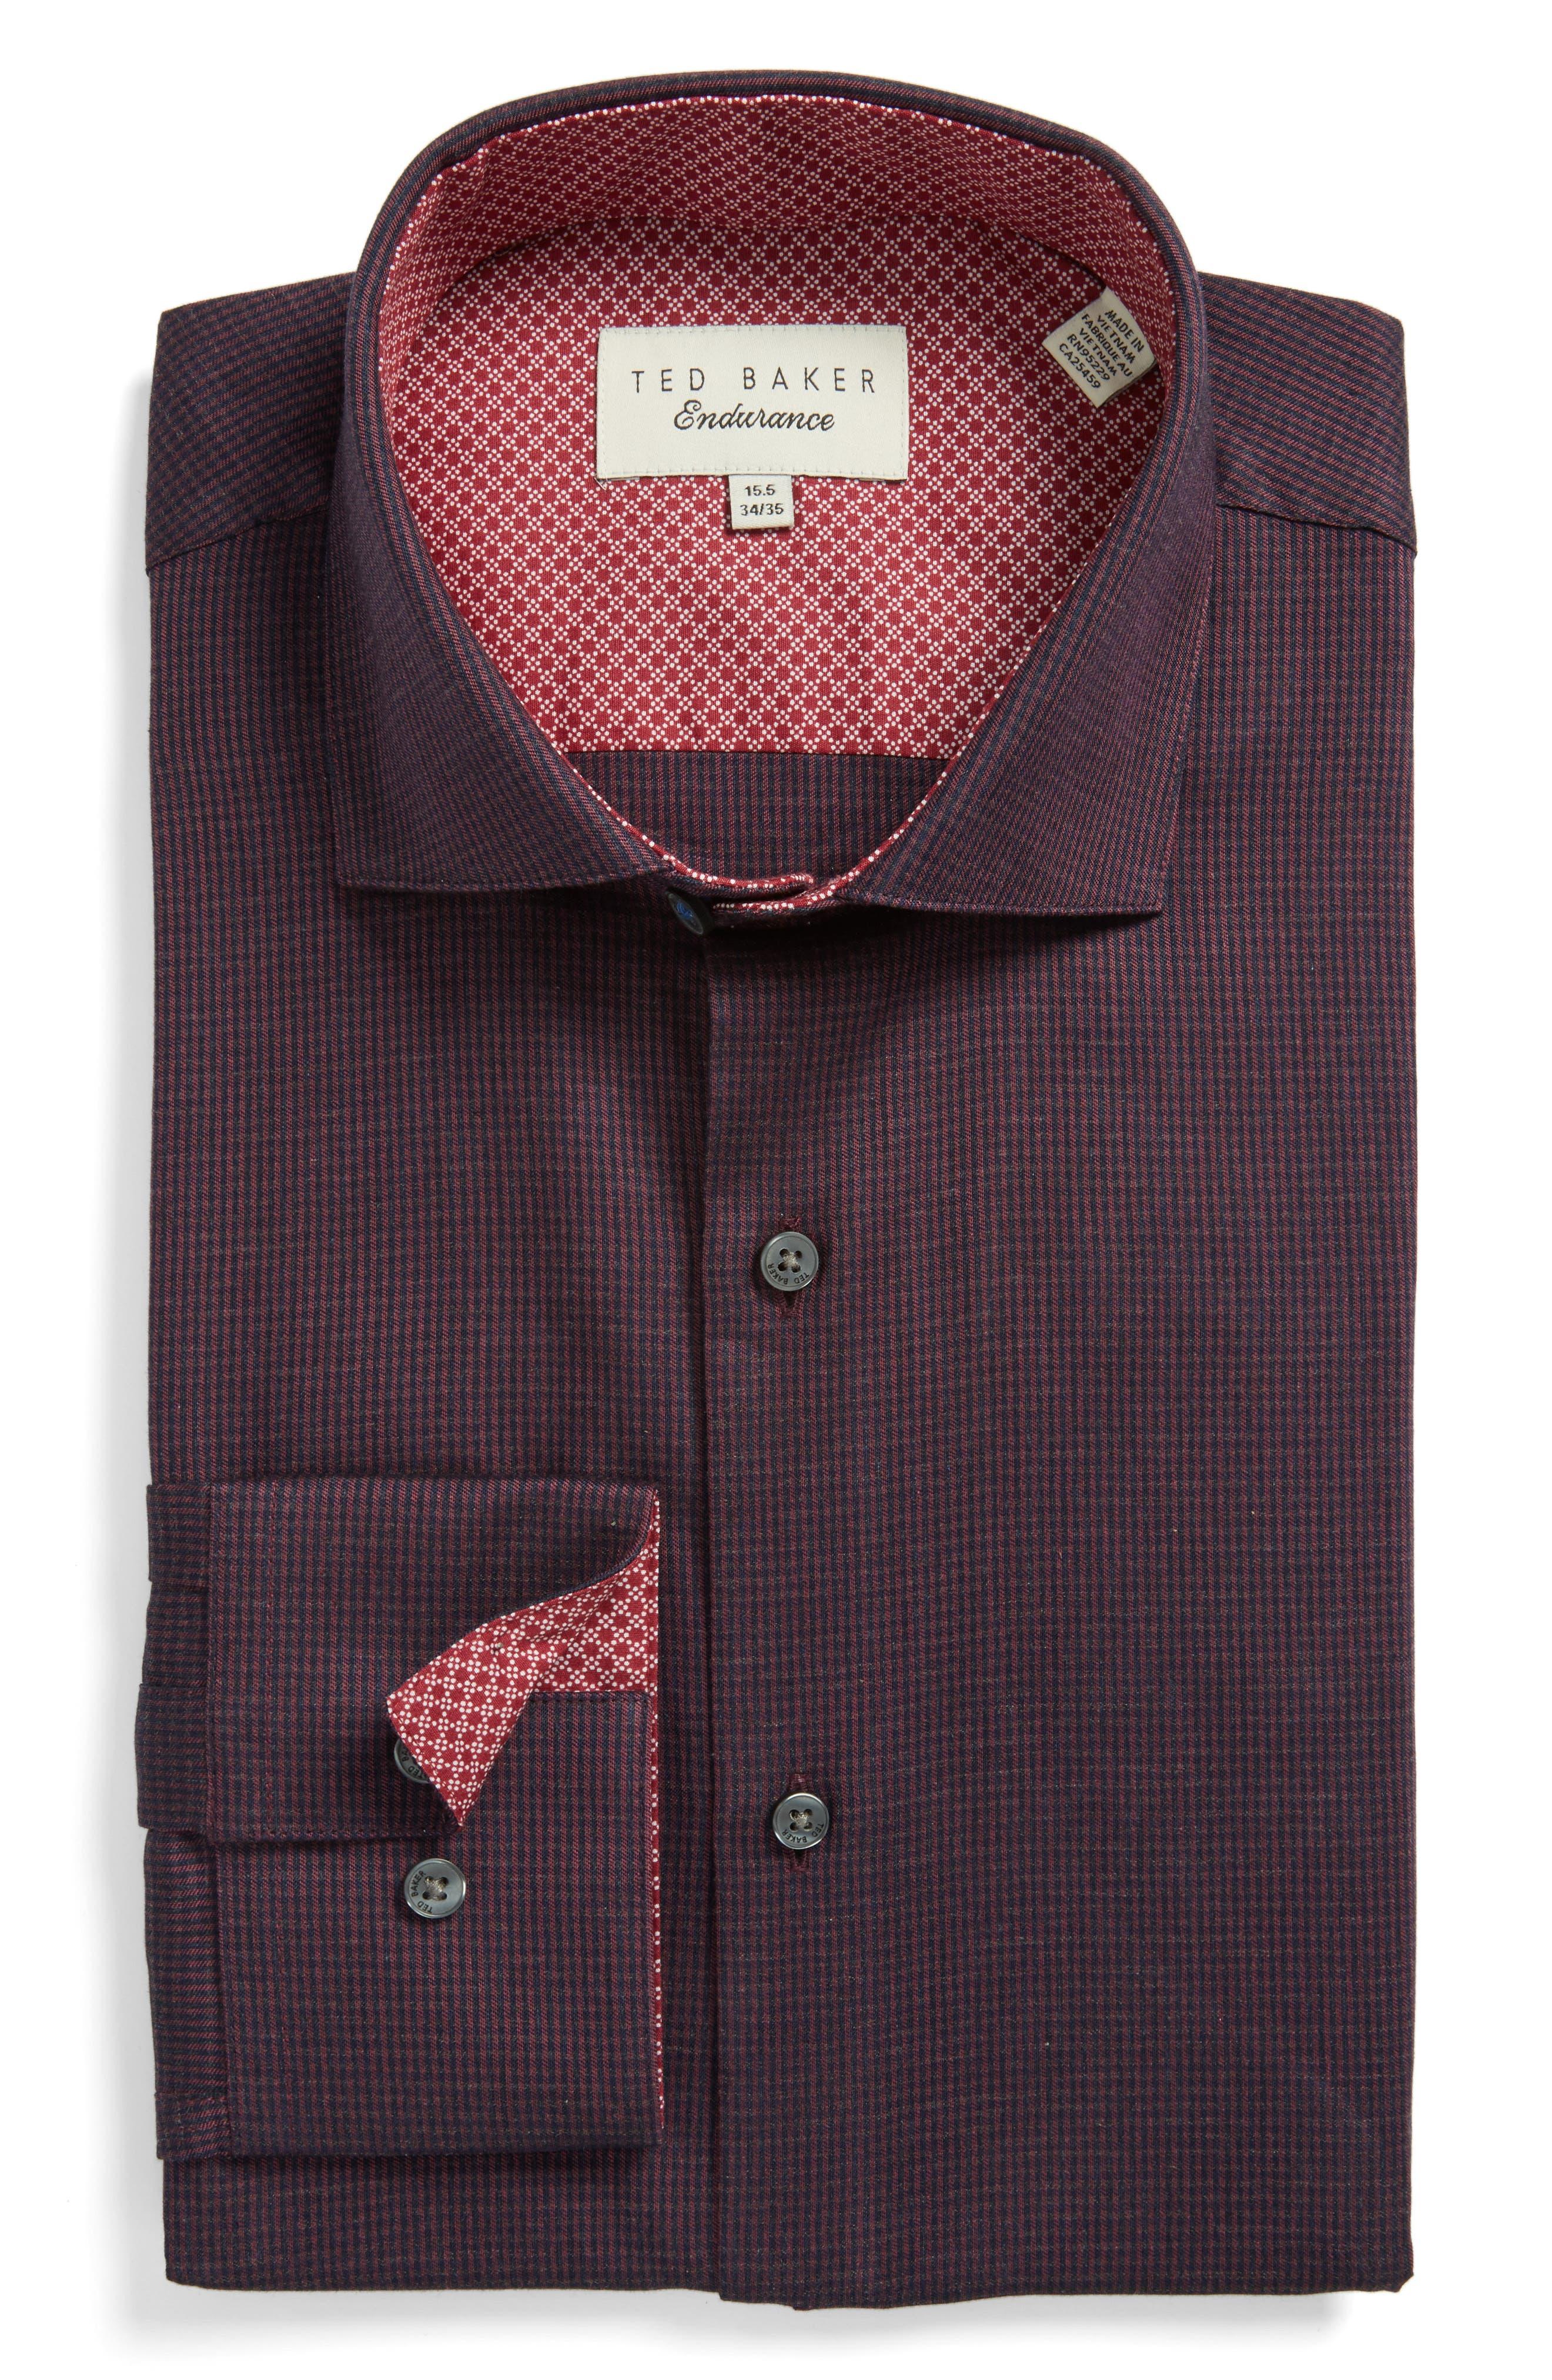 Alternate Image 1 Selected - Ted Baker London Endurance Trim Fit Pattern Dress Shirt